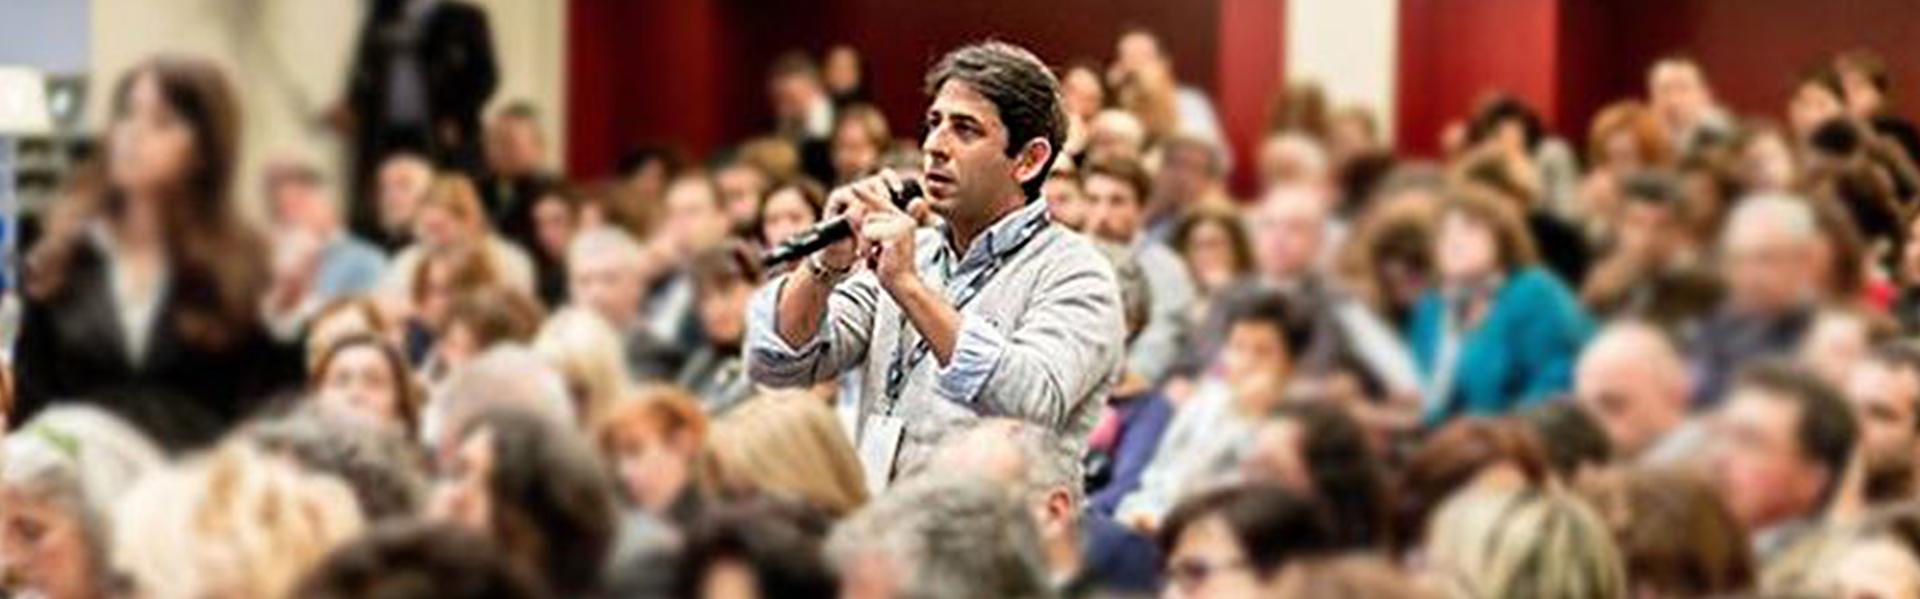 Dermatologia Salerno Dott. Ligrone